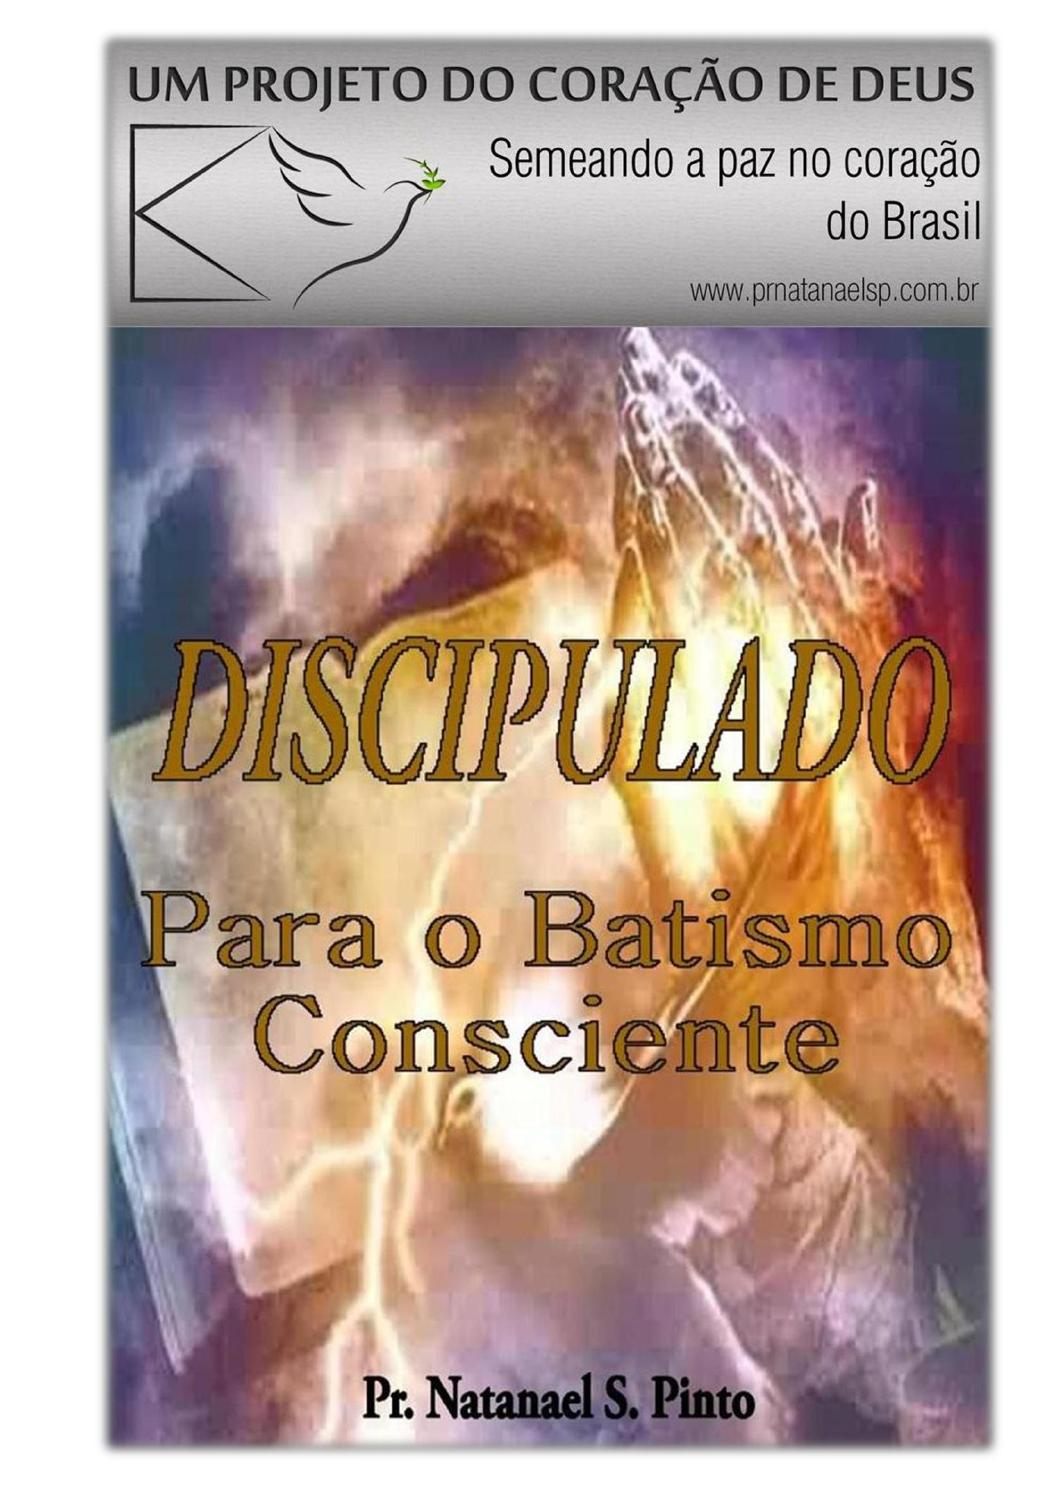 PARA BAIXAR APOSTILA DE DISCIPULADO